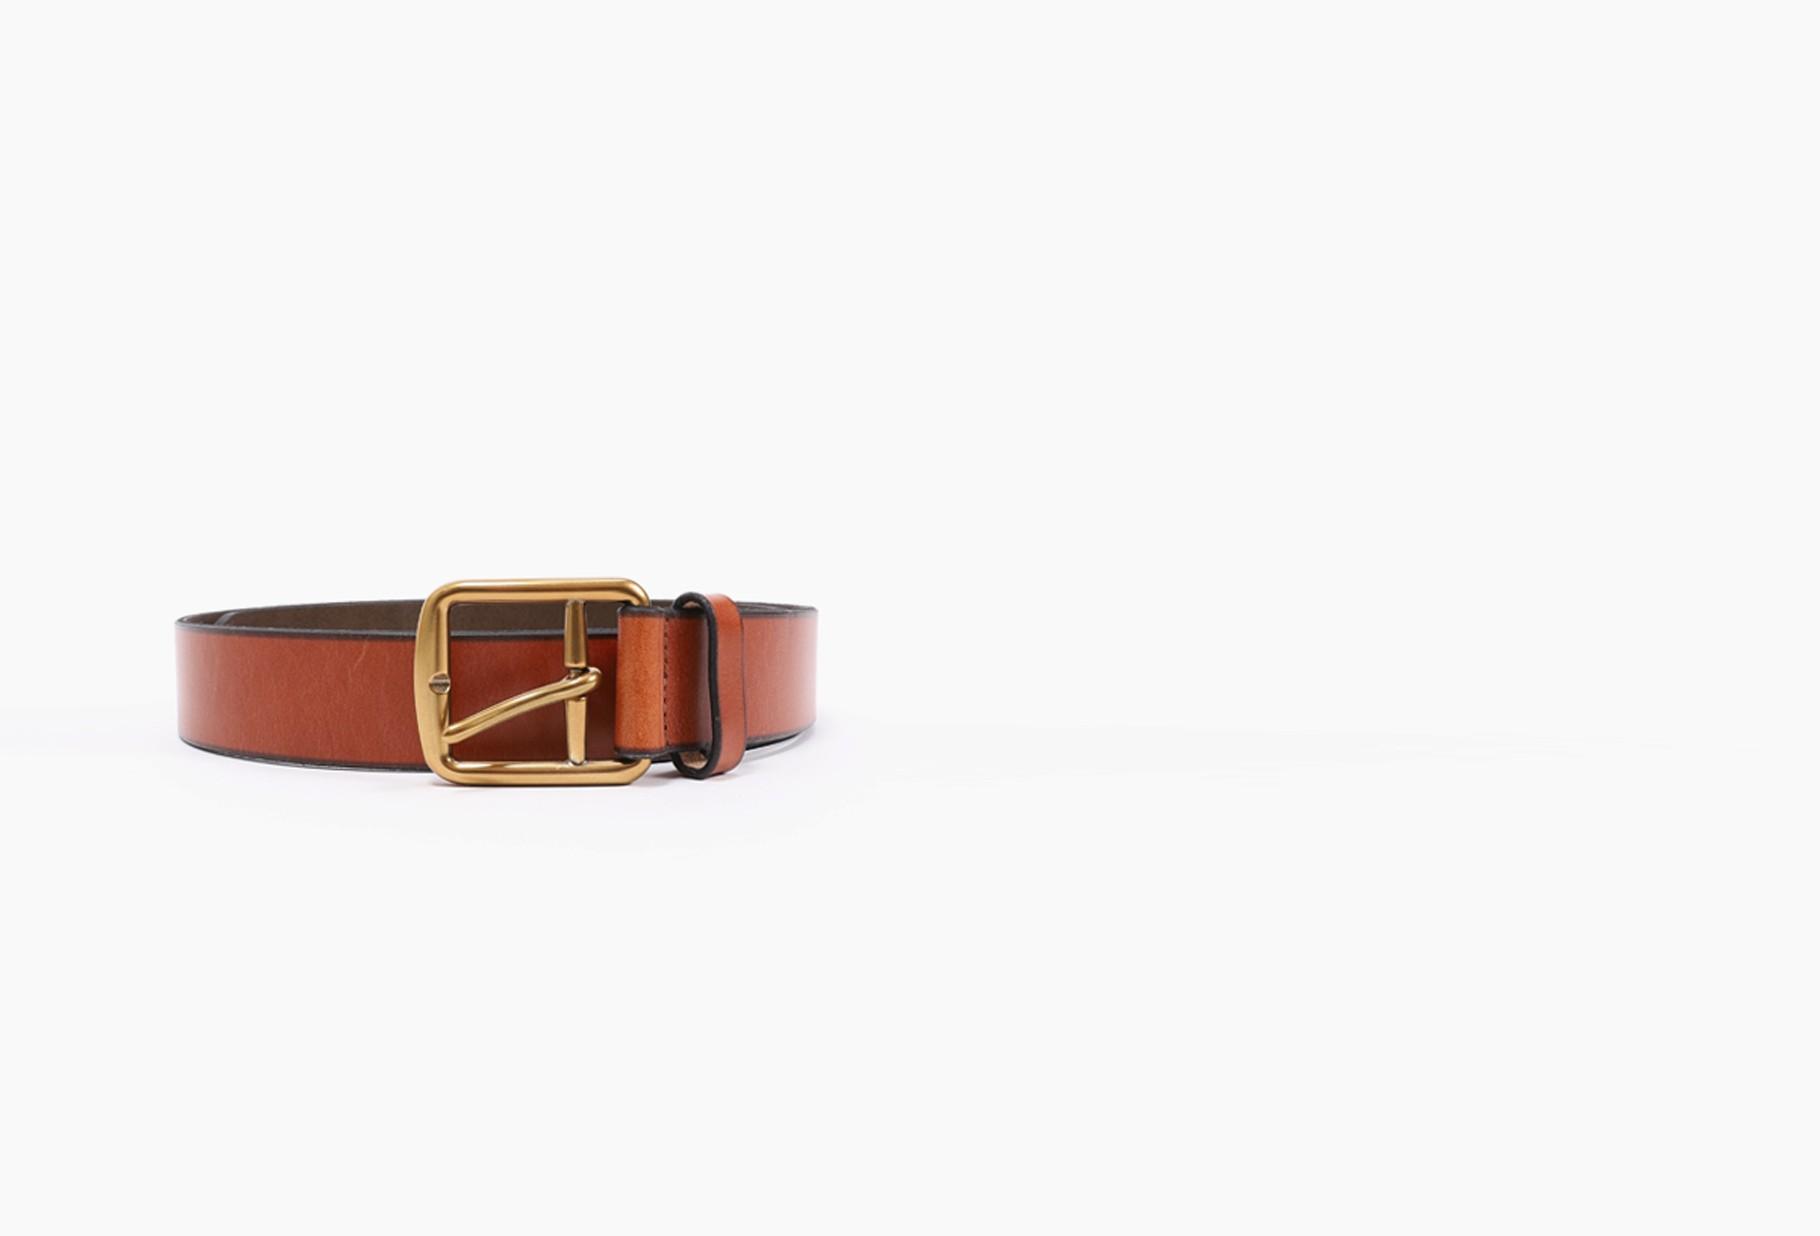 POLO RALPH LAUREN / 3/8 saddlr dress leather Brown